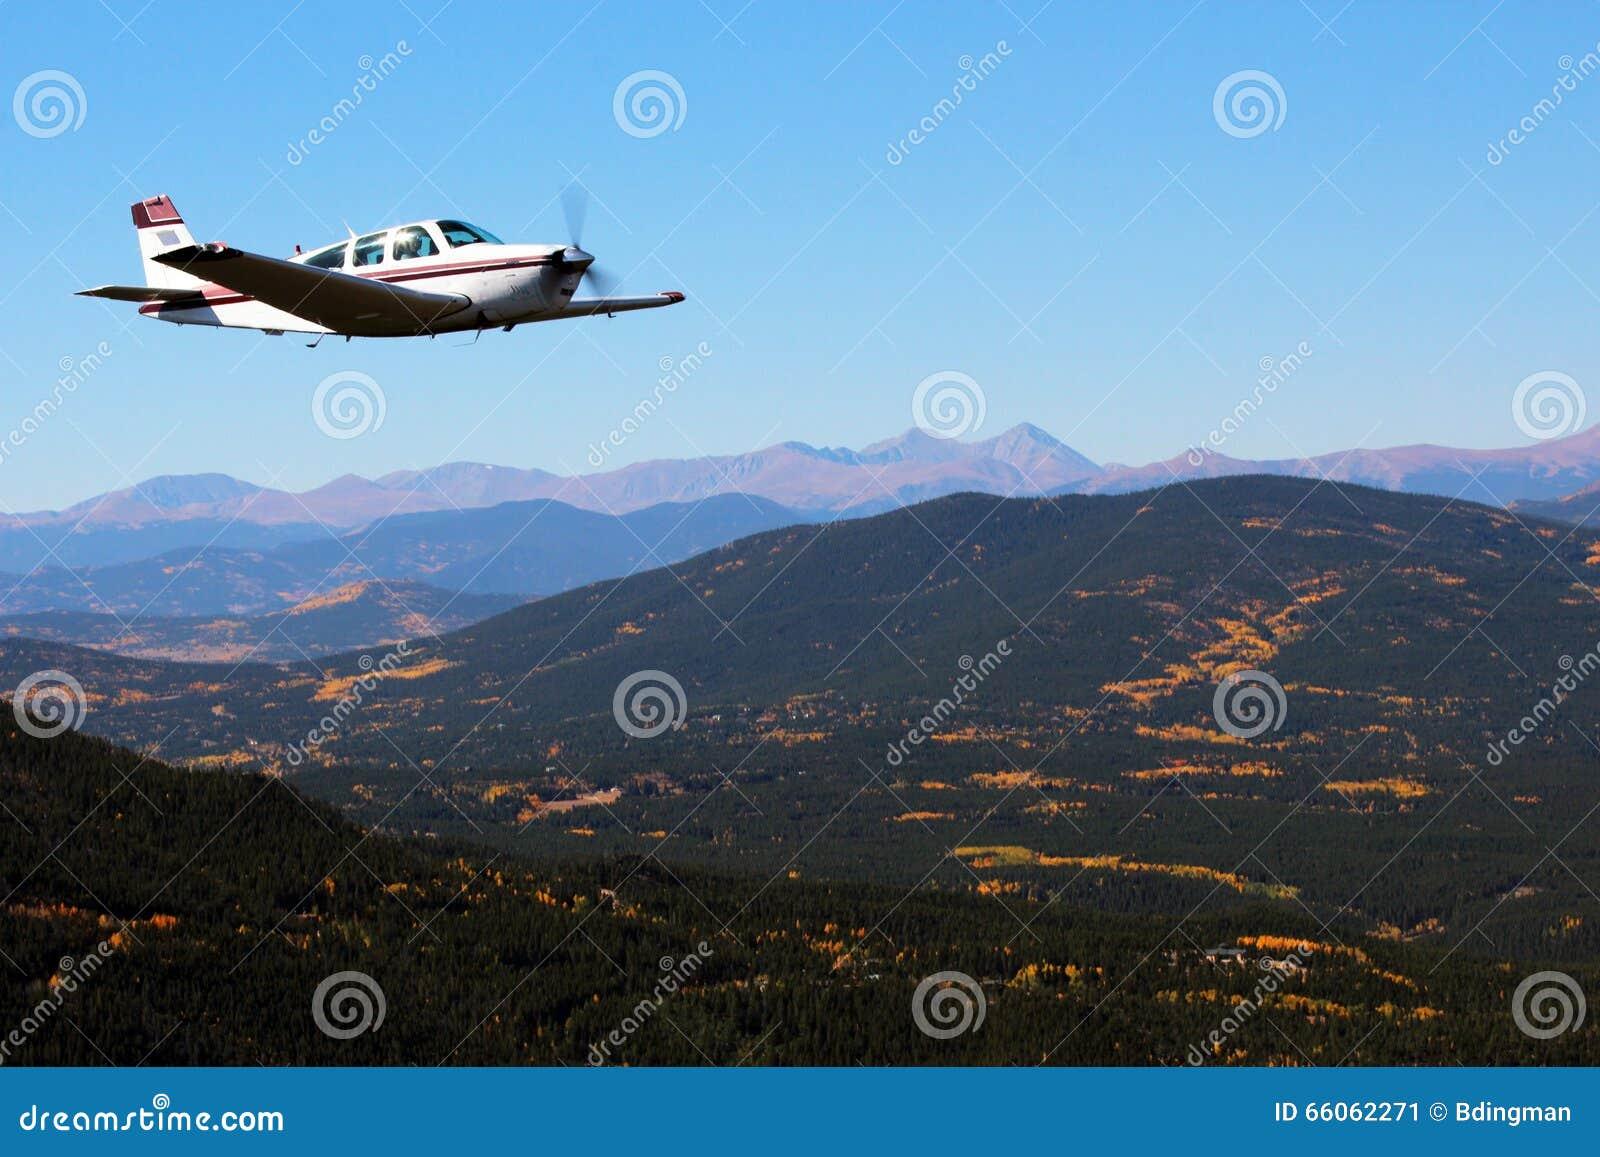 General Aviation - Beechcraft Bonanza Stock Image - Image of flying